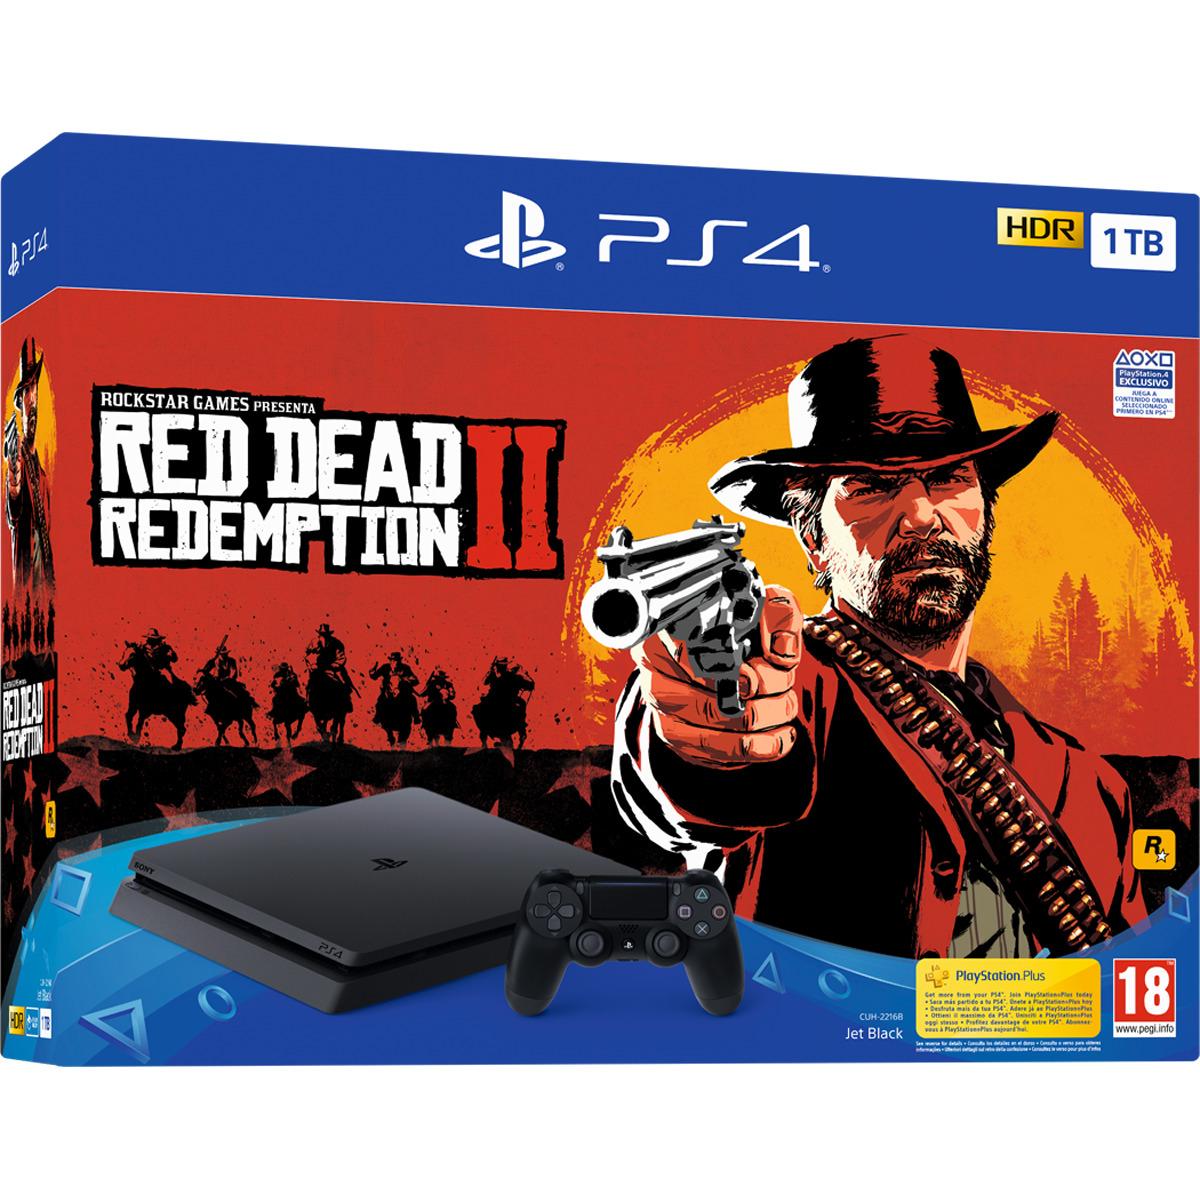 Consola PS4 Slim 1TB + Red Dead Redemption 2 + Spiderman descuento 10 €